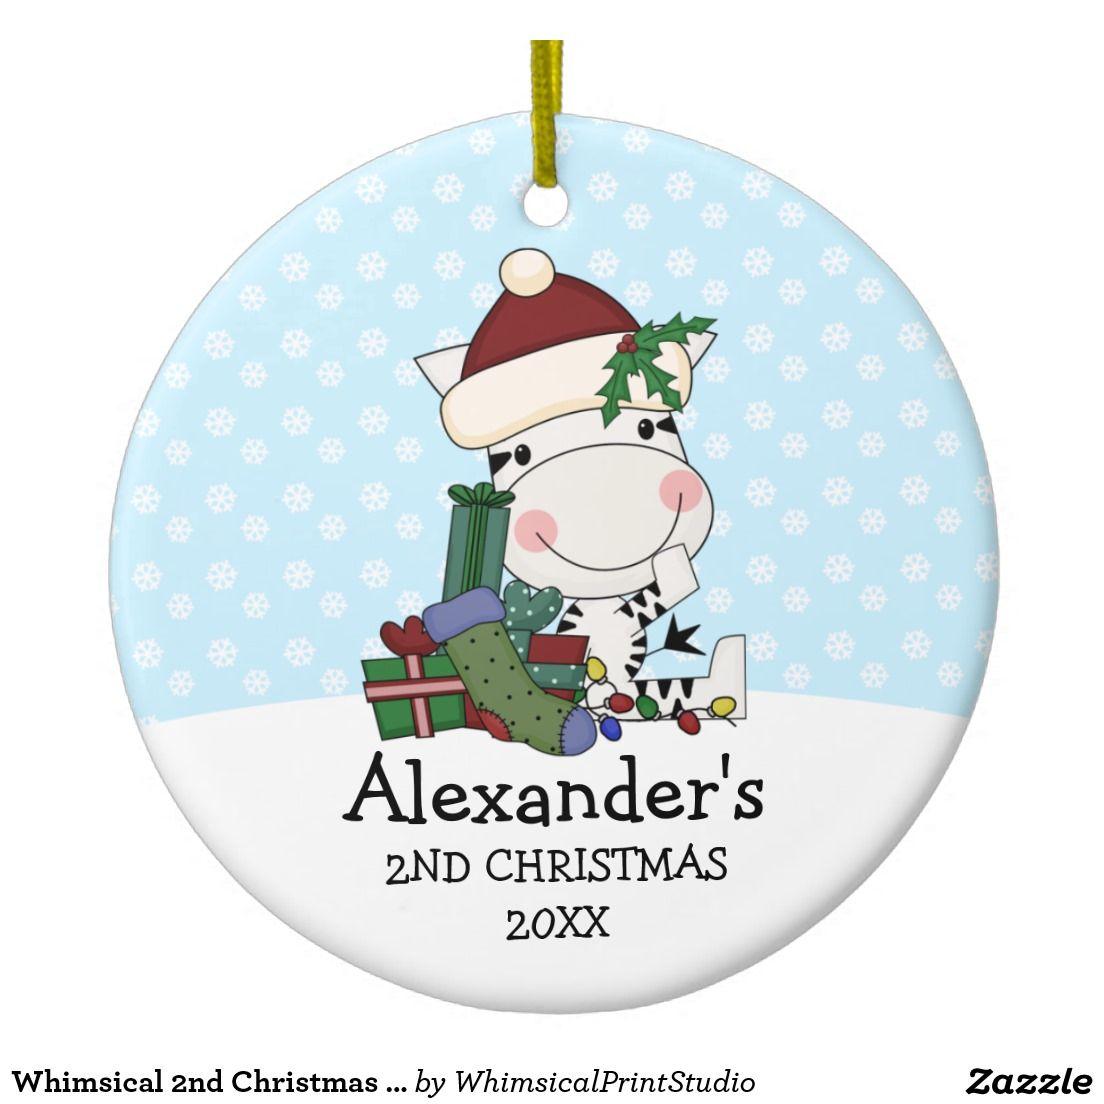 Whimsical 2nd Christmas Santa Zebra Personalized Ceramic Ornament